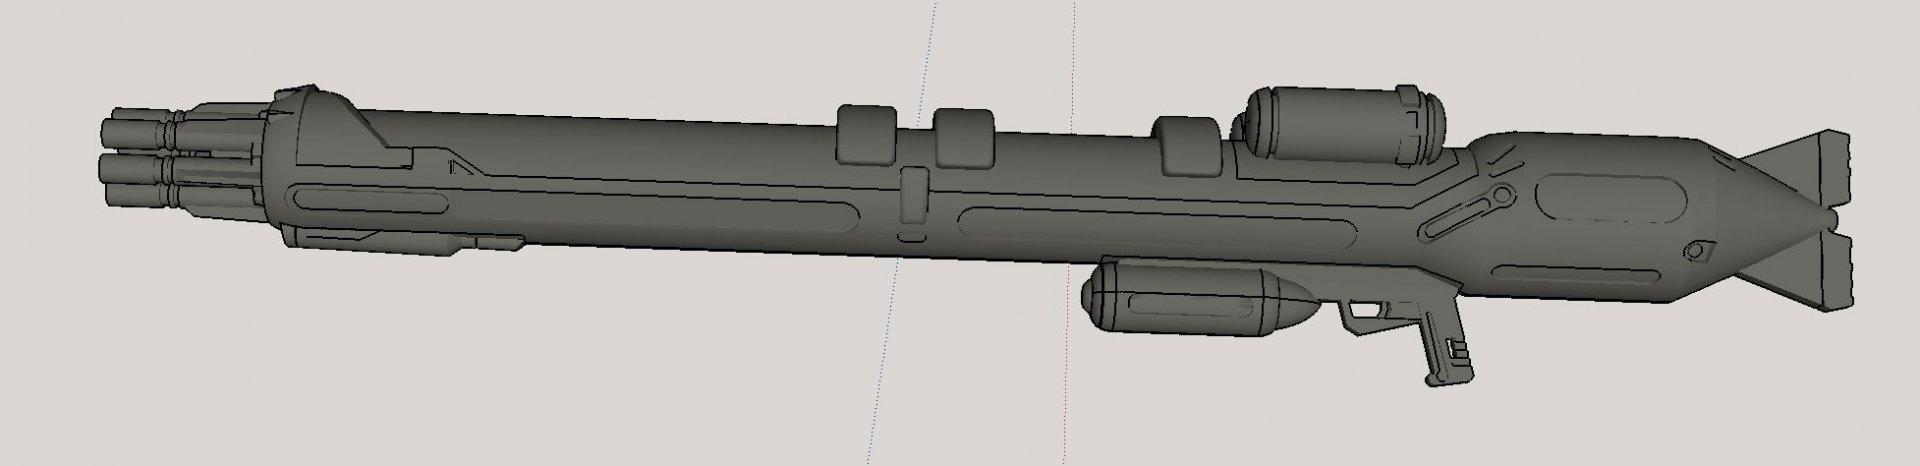 VF-11_Gun_01.jpg